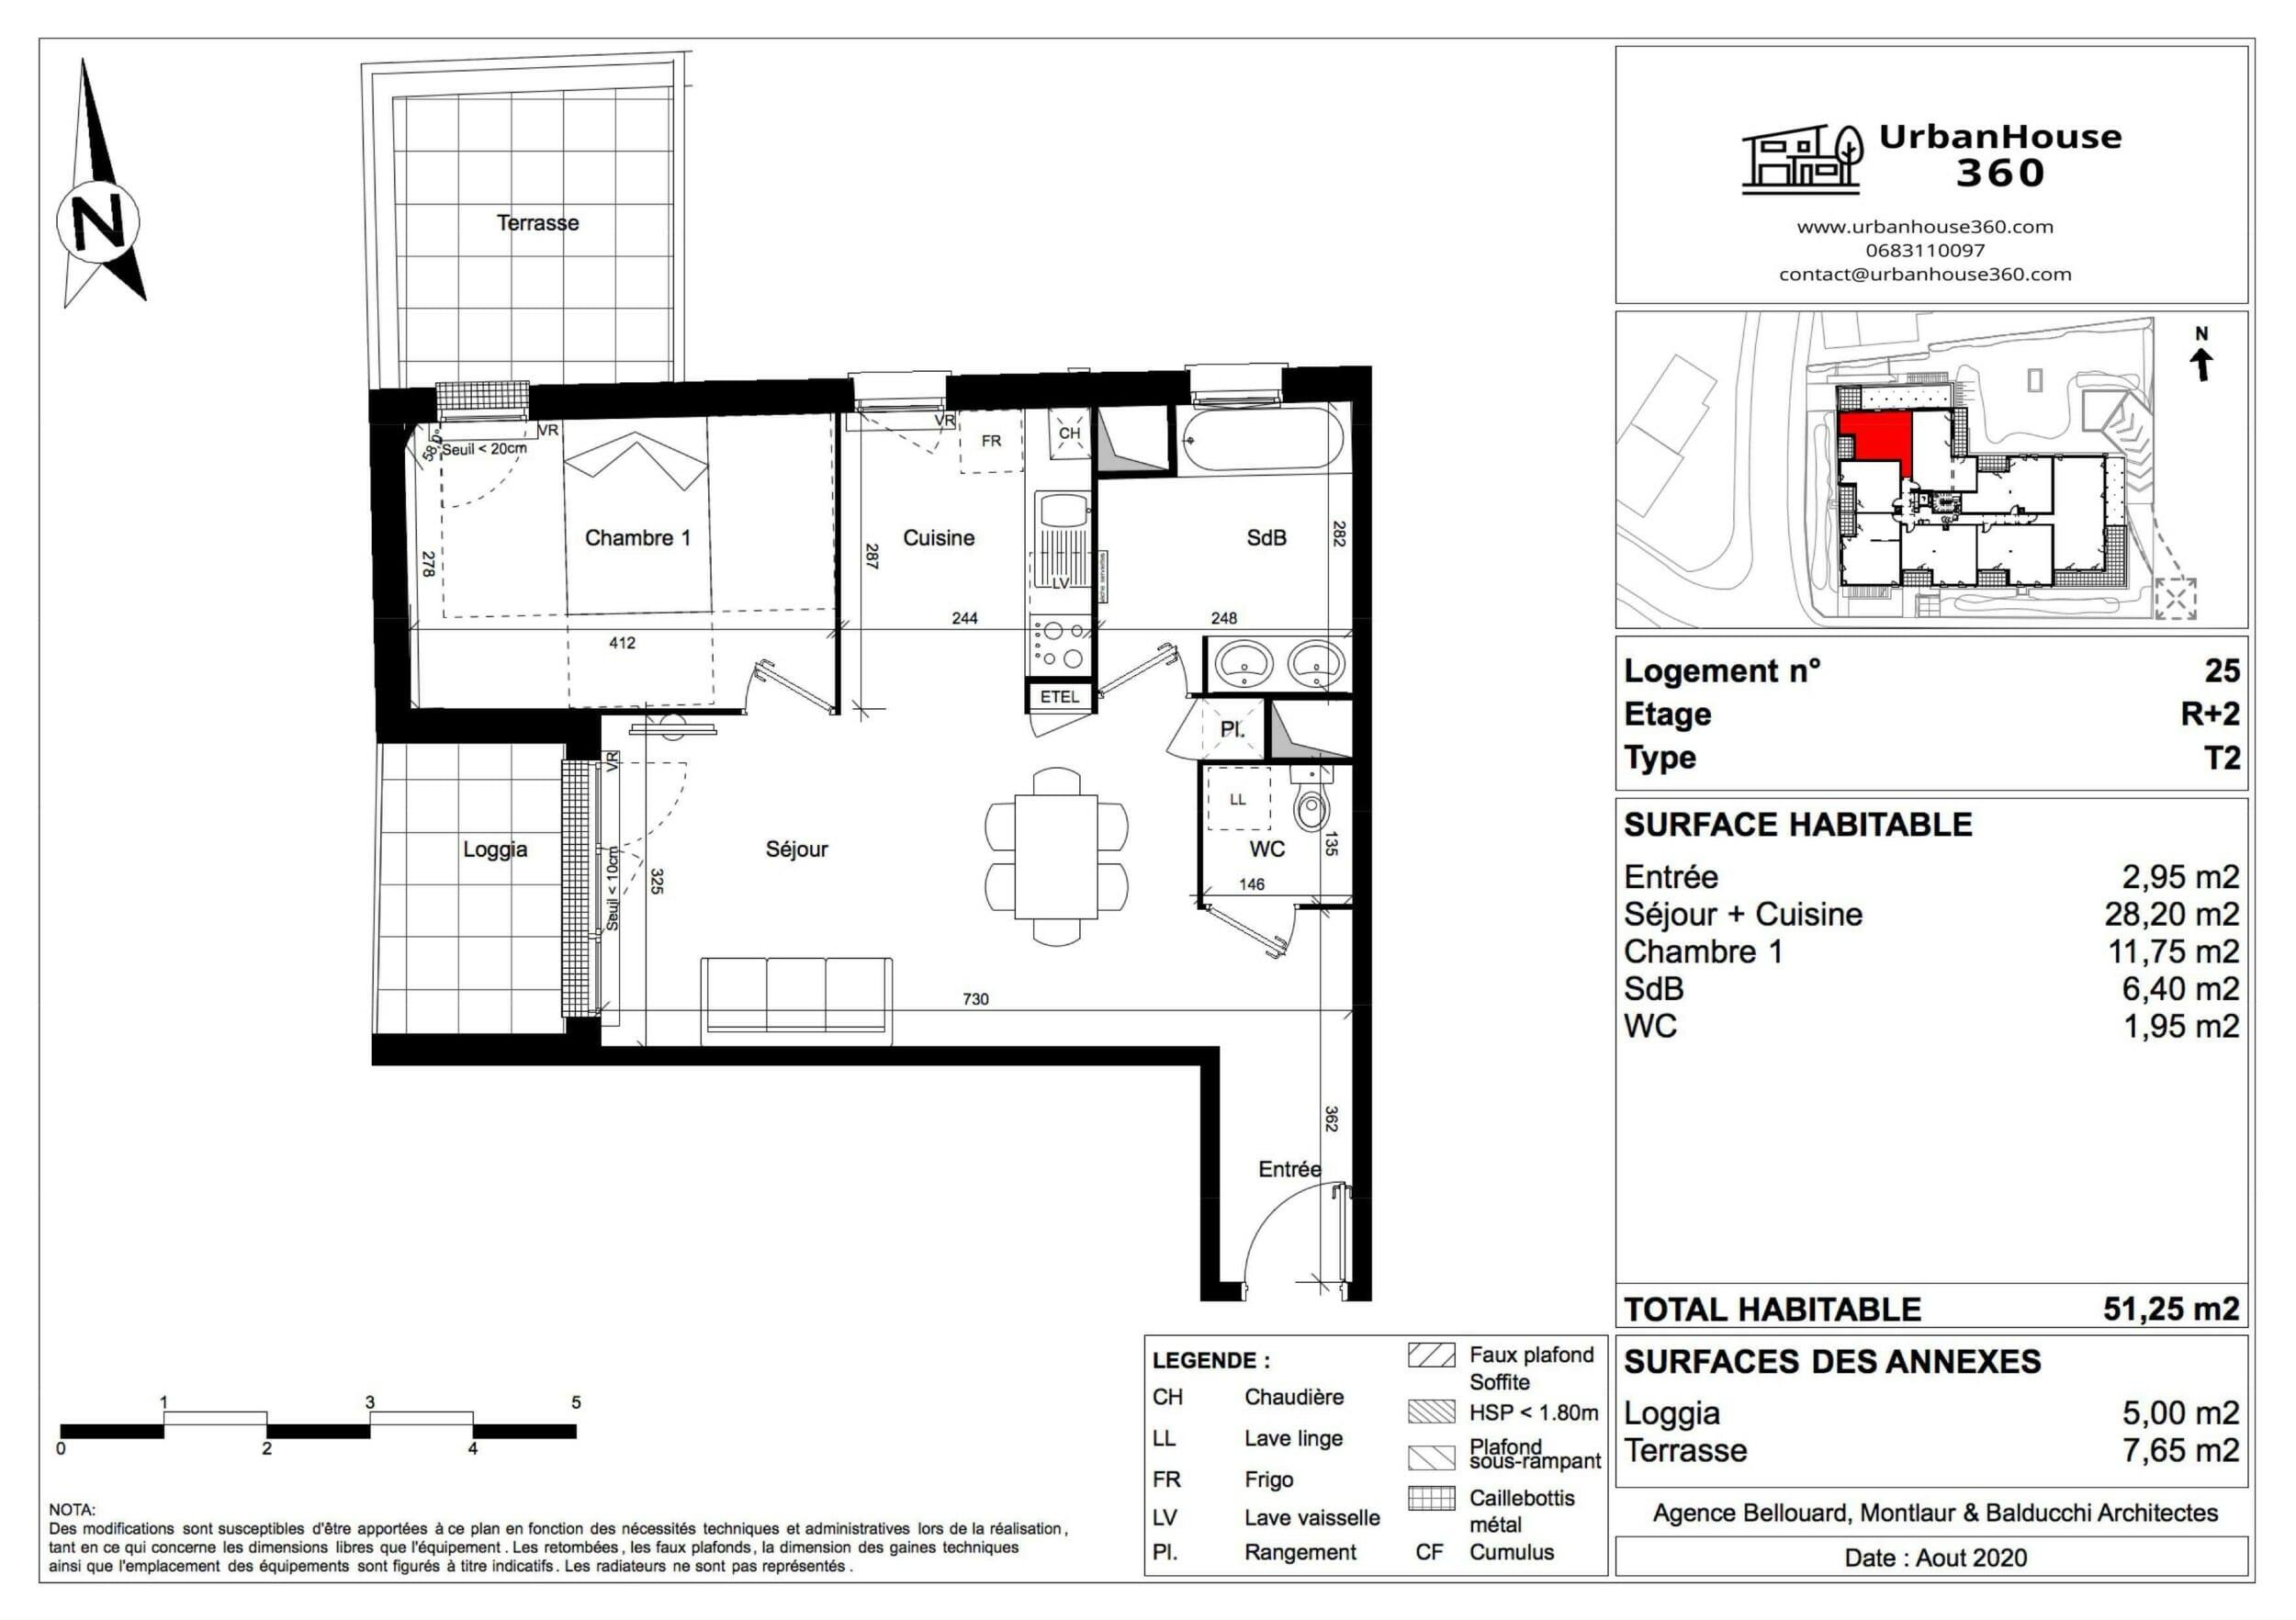 Urbanhouse360-Symphonie-Plan-T2-25